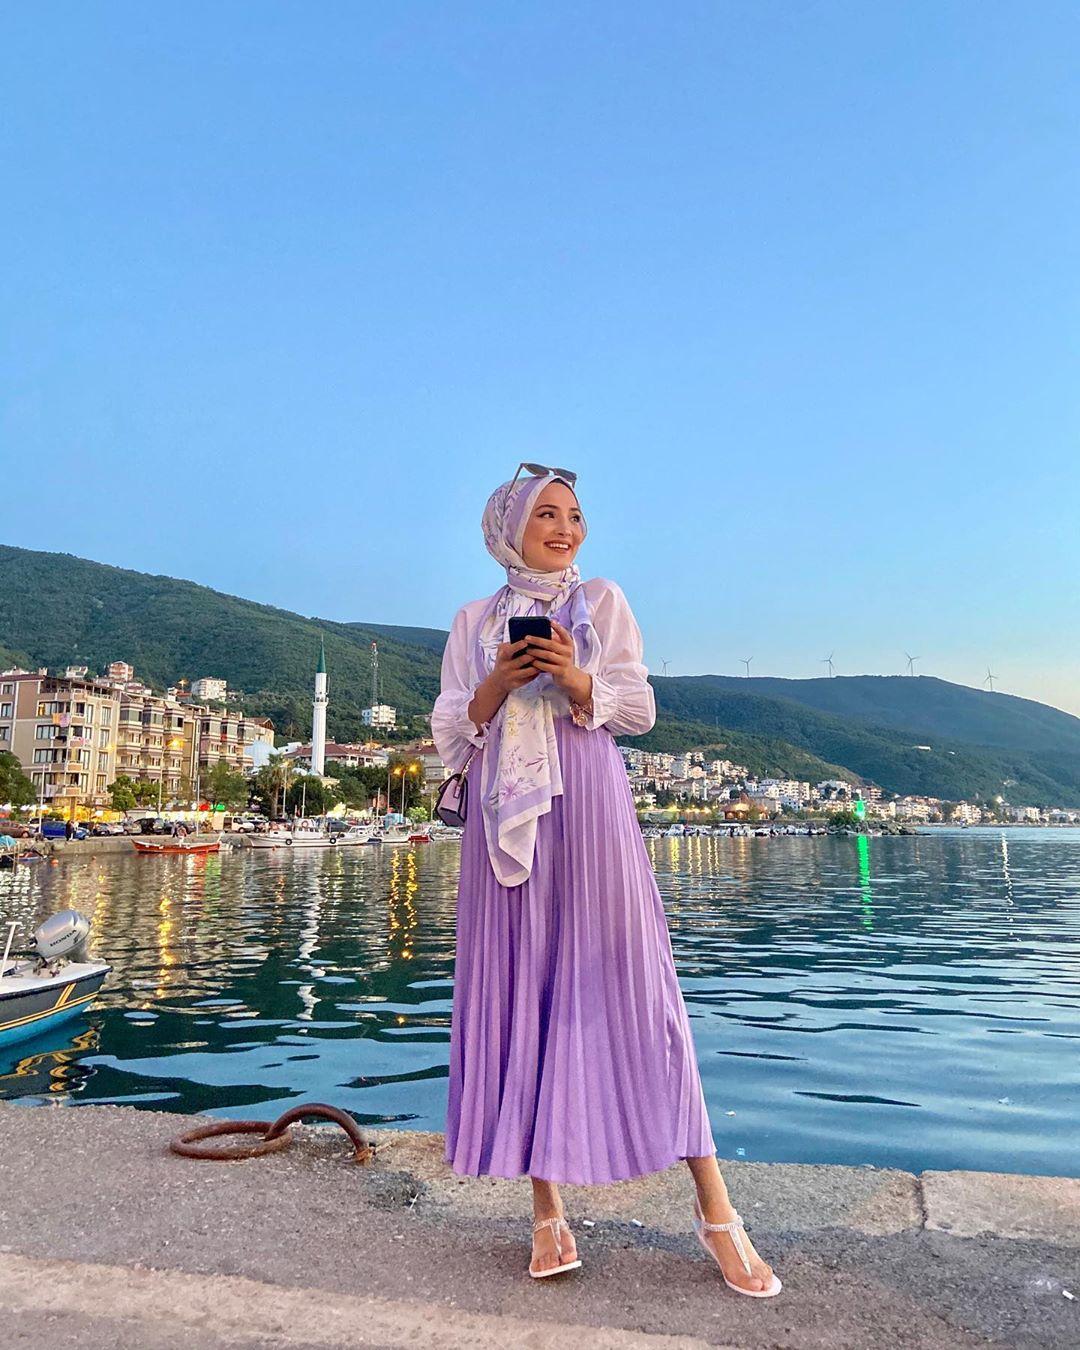 2020 Fashion Trend Lilac Hijab Outfit Ideas